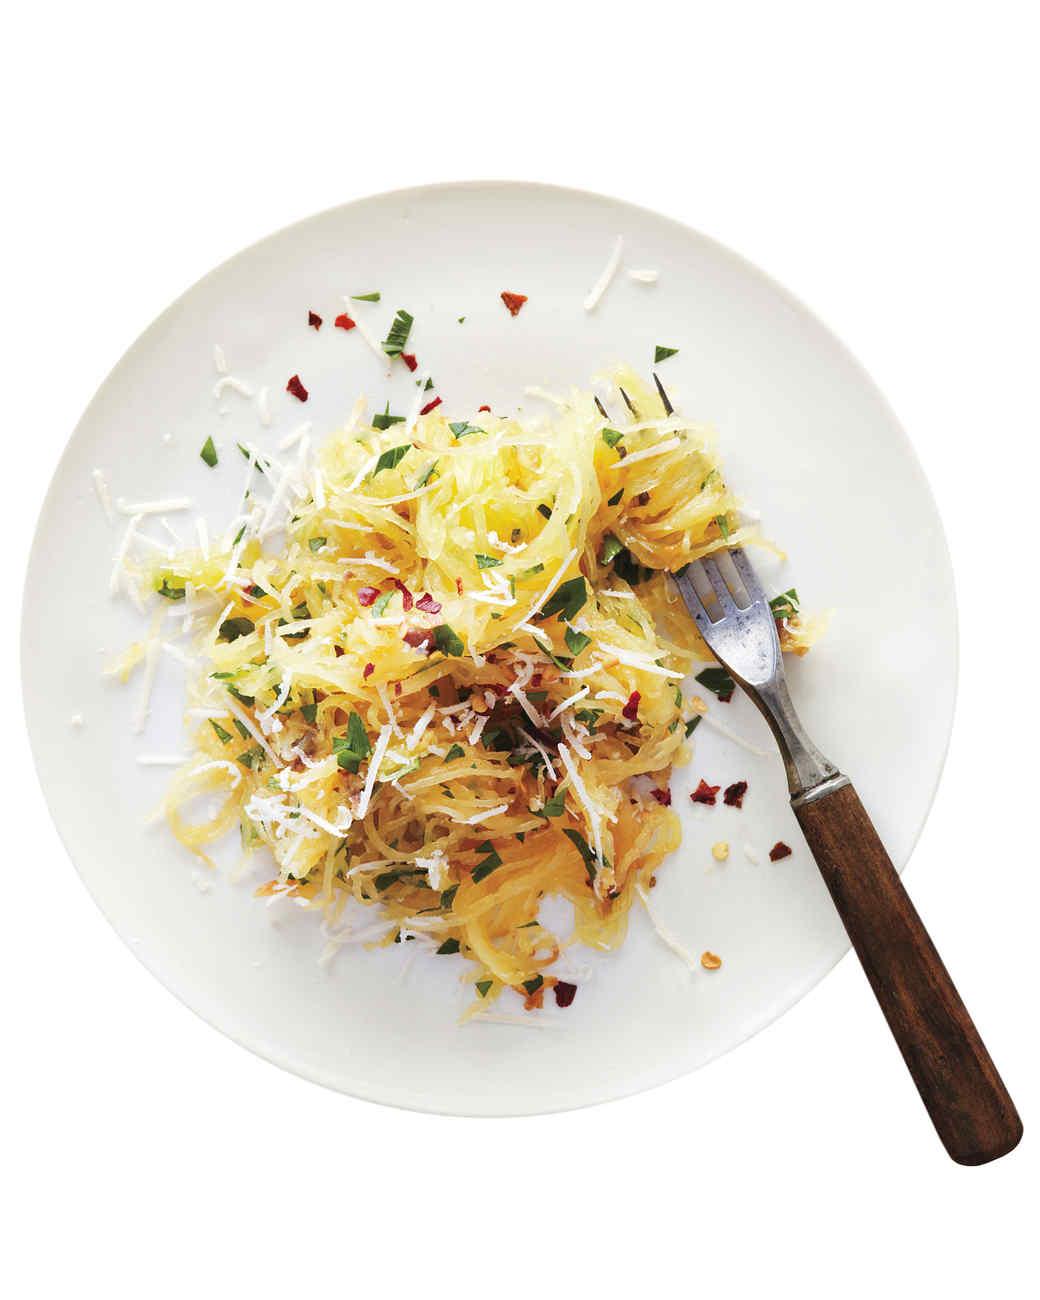 Roasted Spaghetti Squash with Parmesan